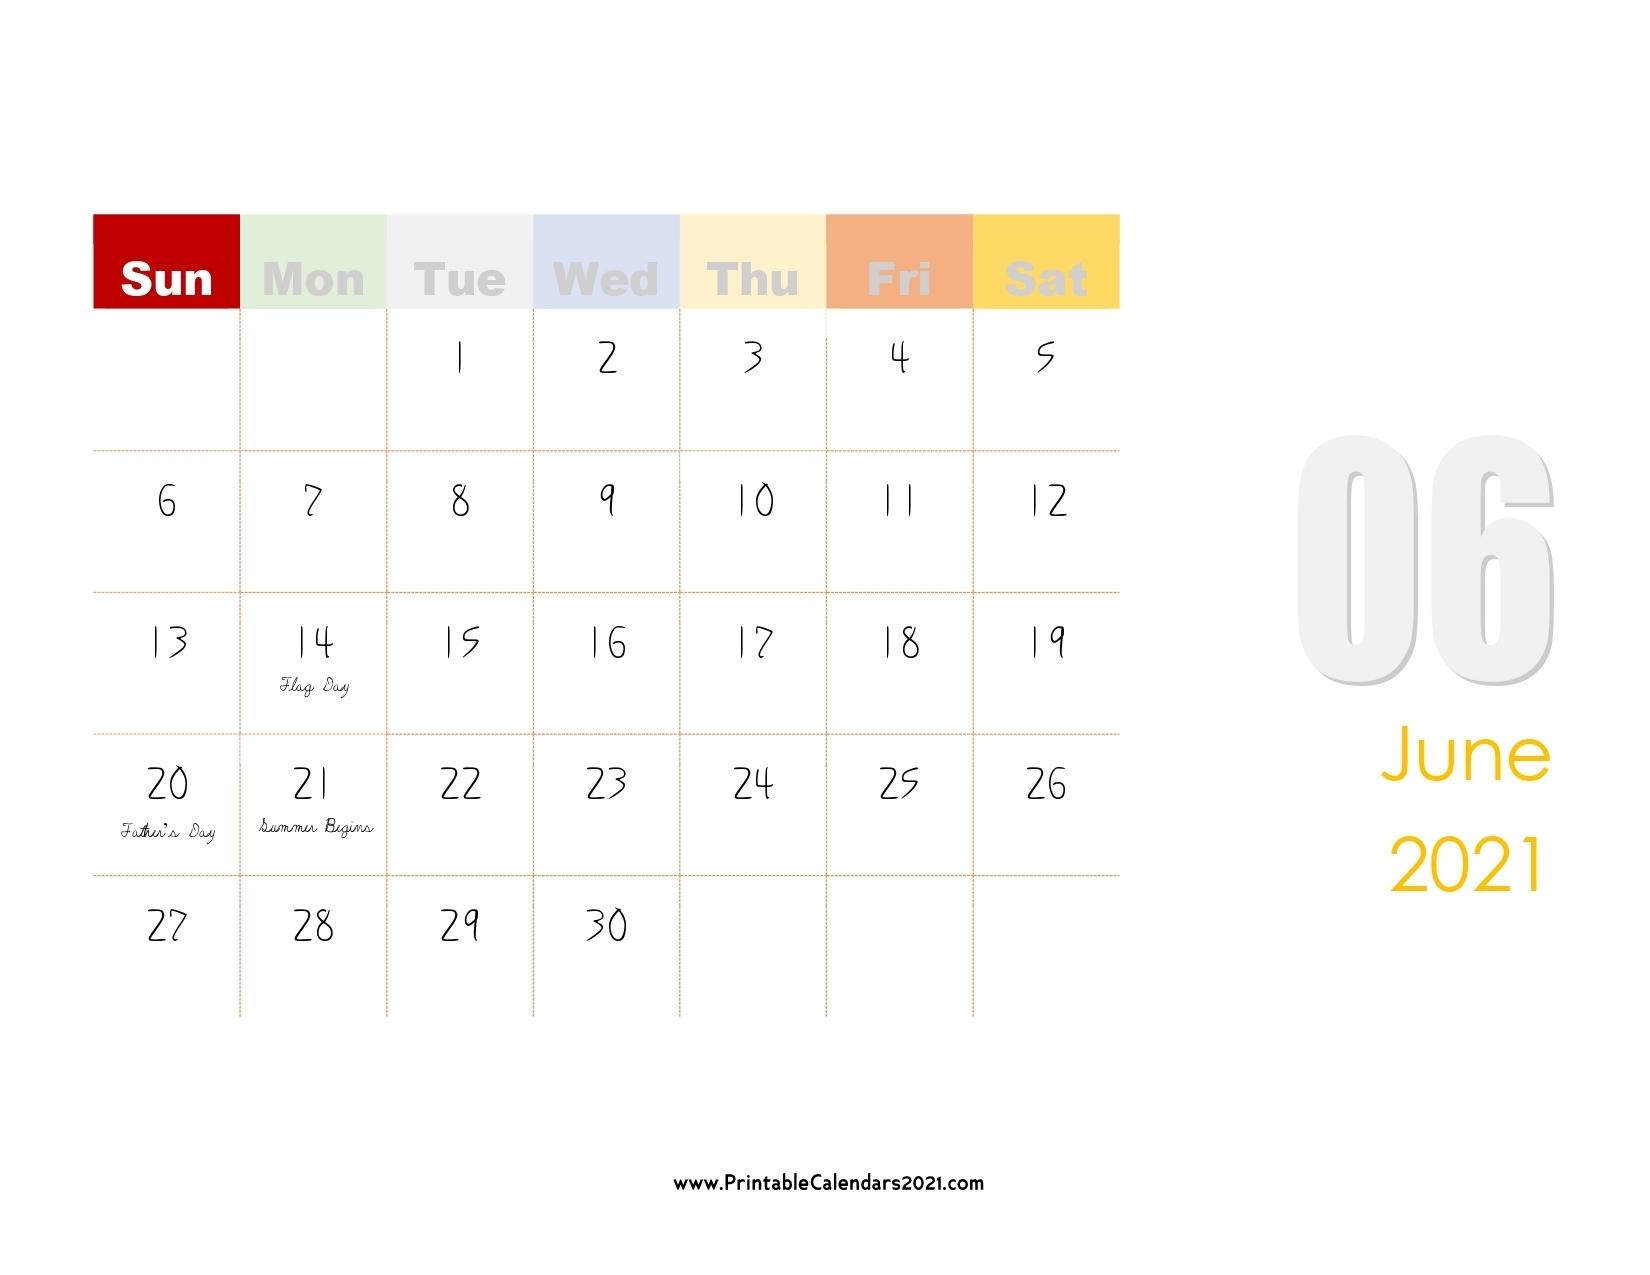 60+ Free June 2021 Calendar Printable With Holidays, Blank, Pdf June 2021 Calendar Holidays